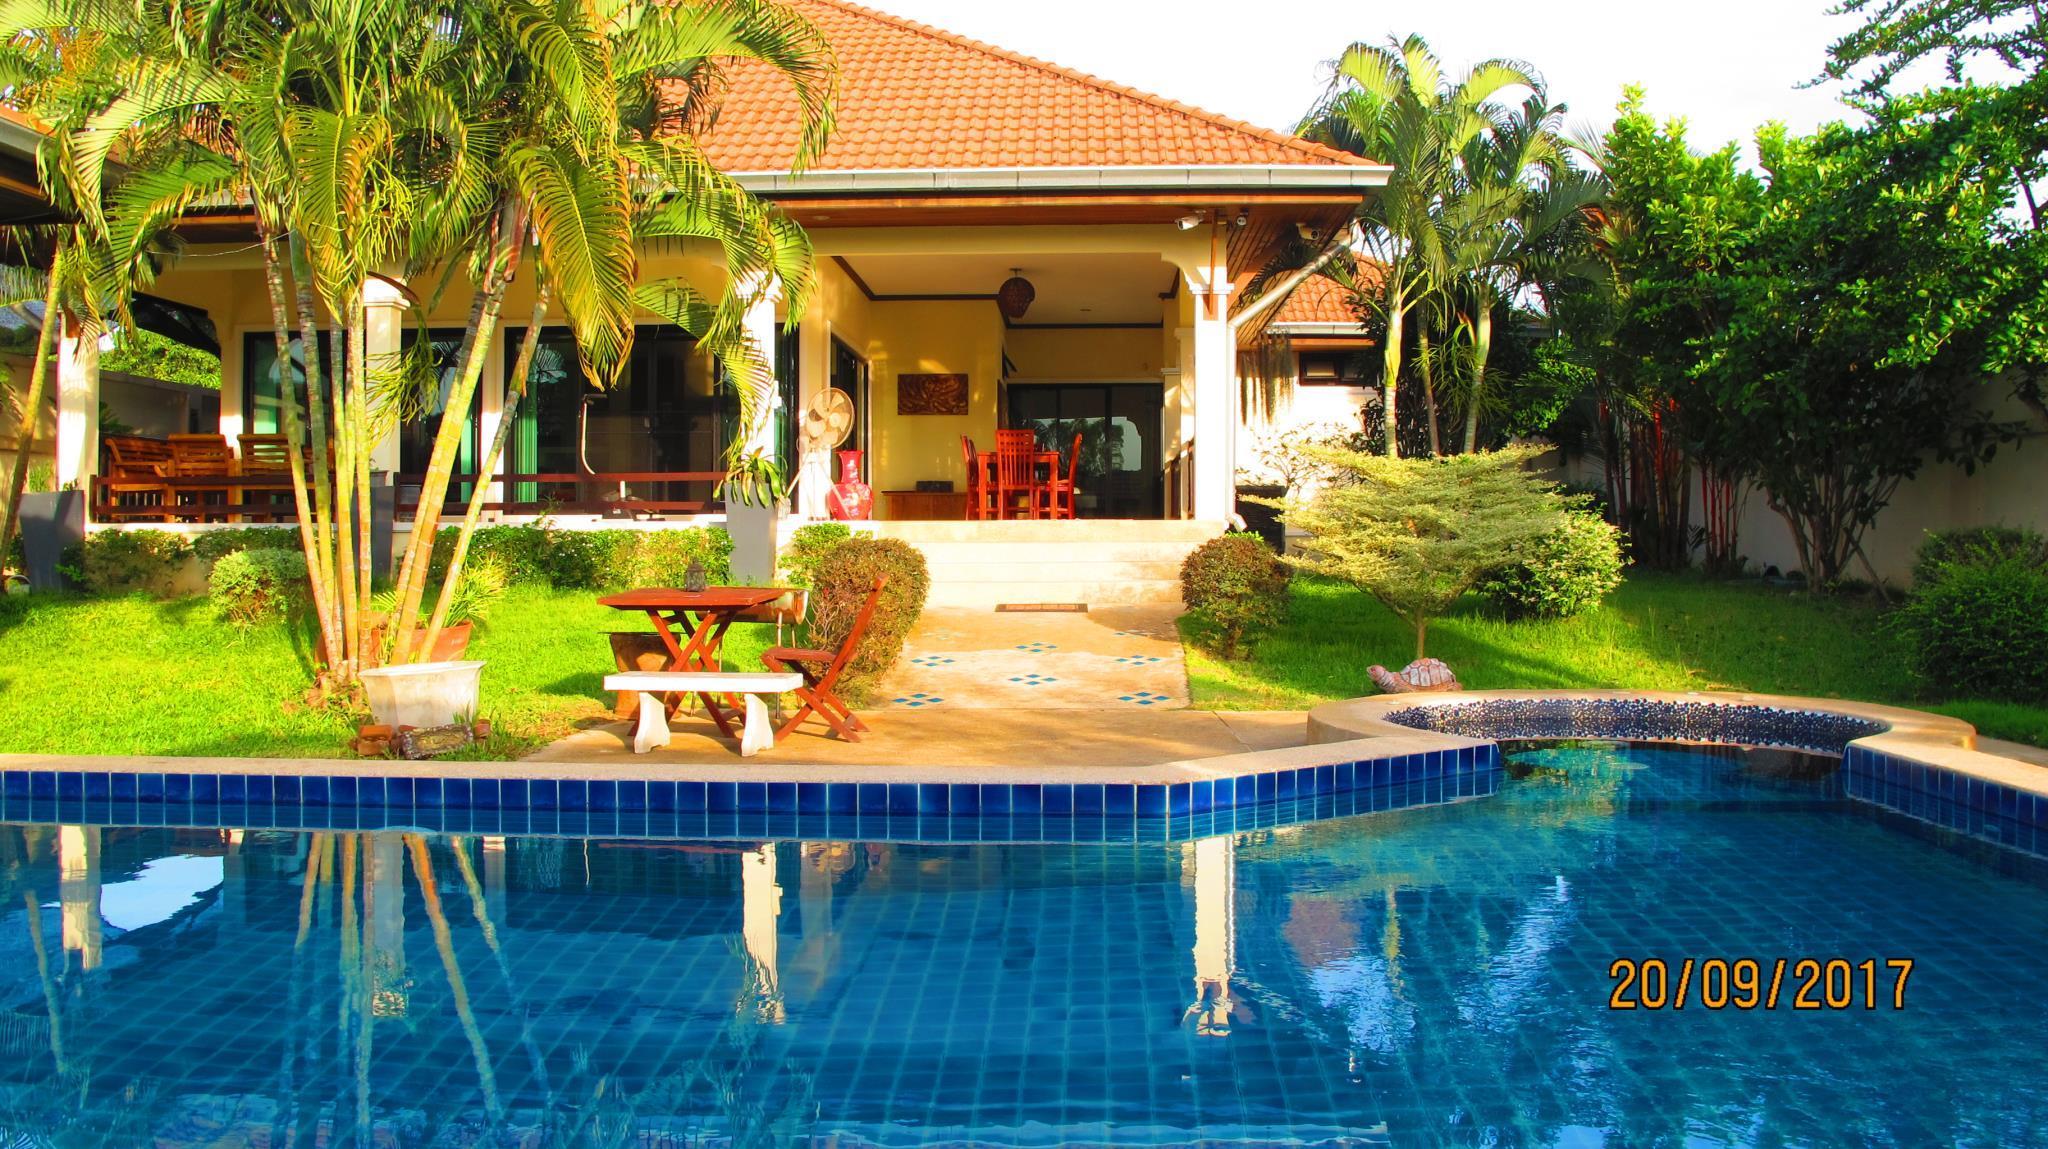 Luxury Pool Villa Rayong,Luxury Pool Villa Rayong